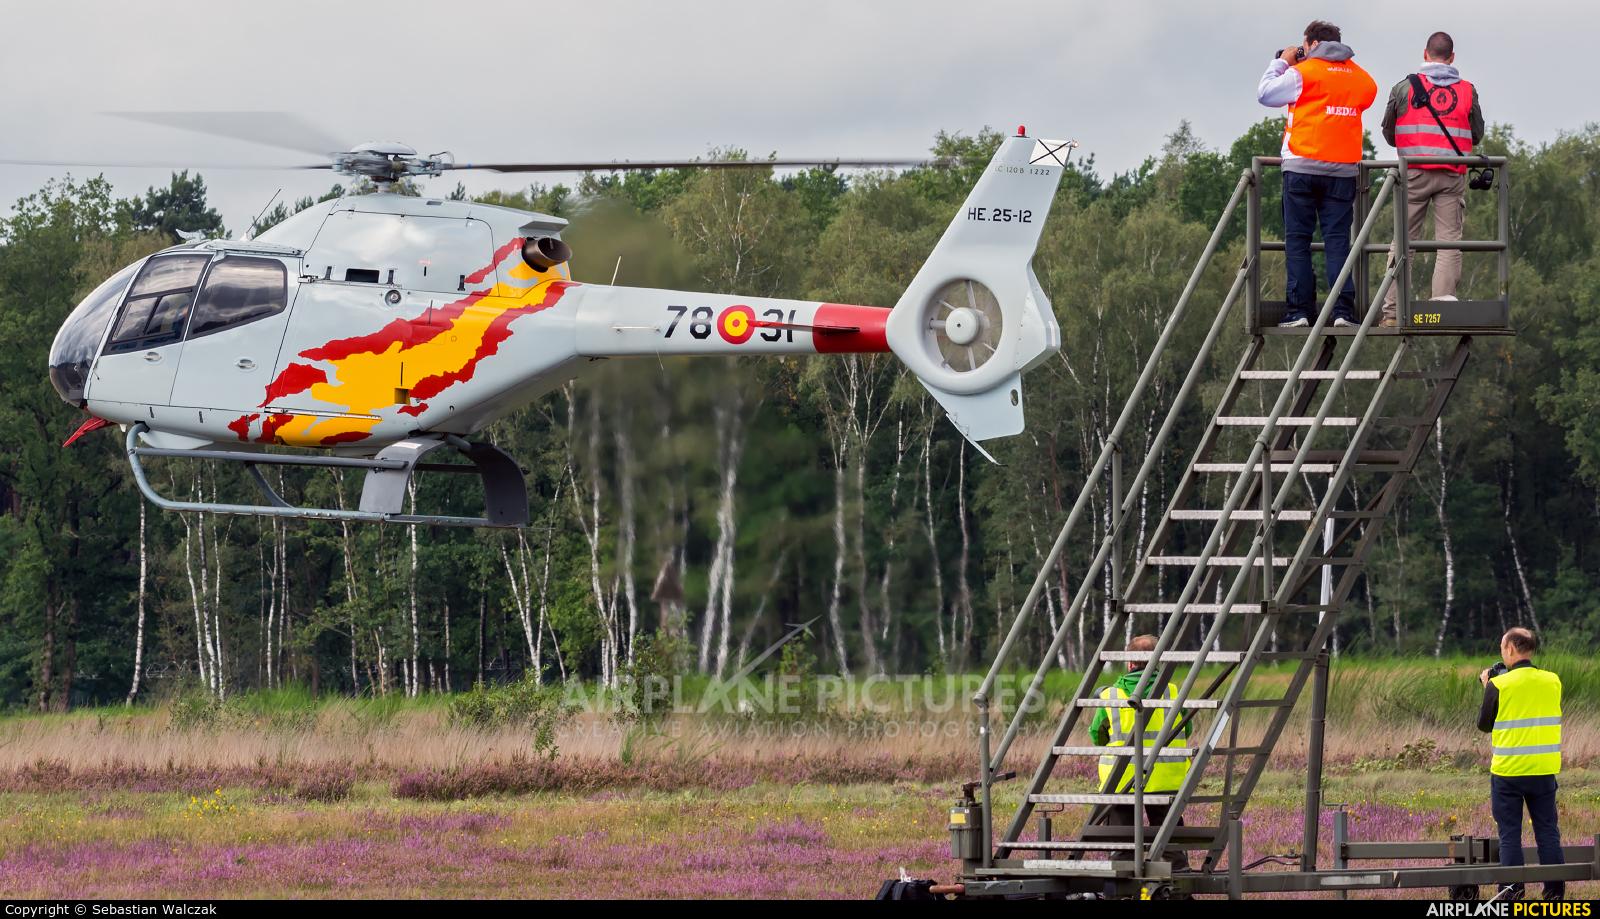 Spain - Air Force: Patrulla ASPA HE.25-12 aircraft at Kleine Brogel